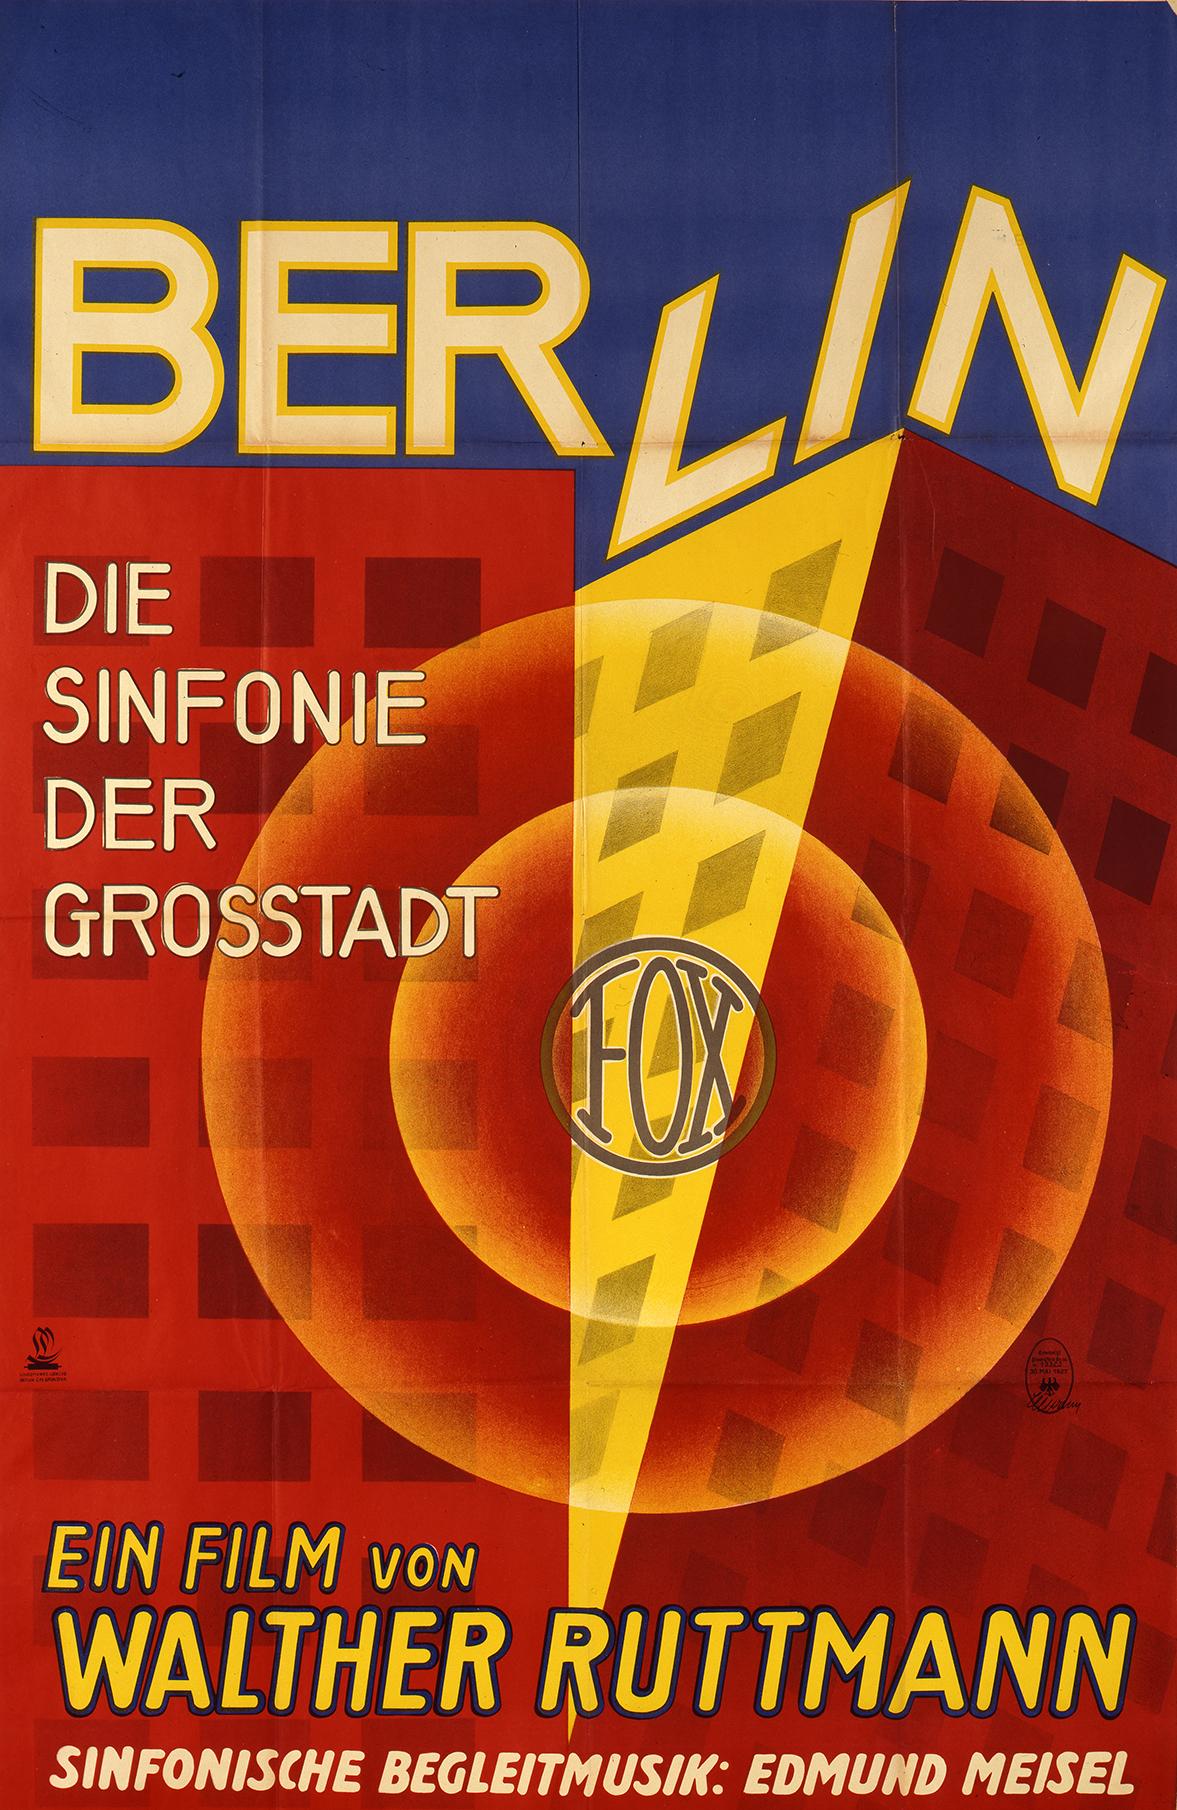 7. Berlin Symphony of a Metropolis film poster, 1927